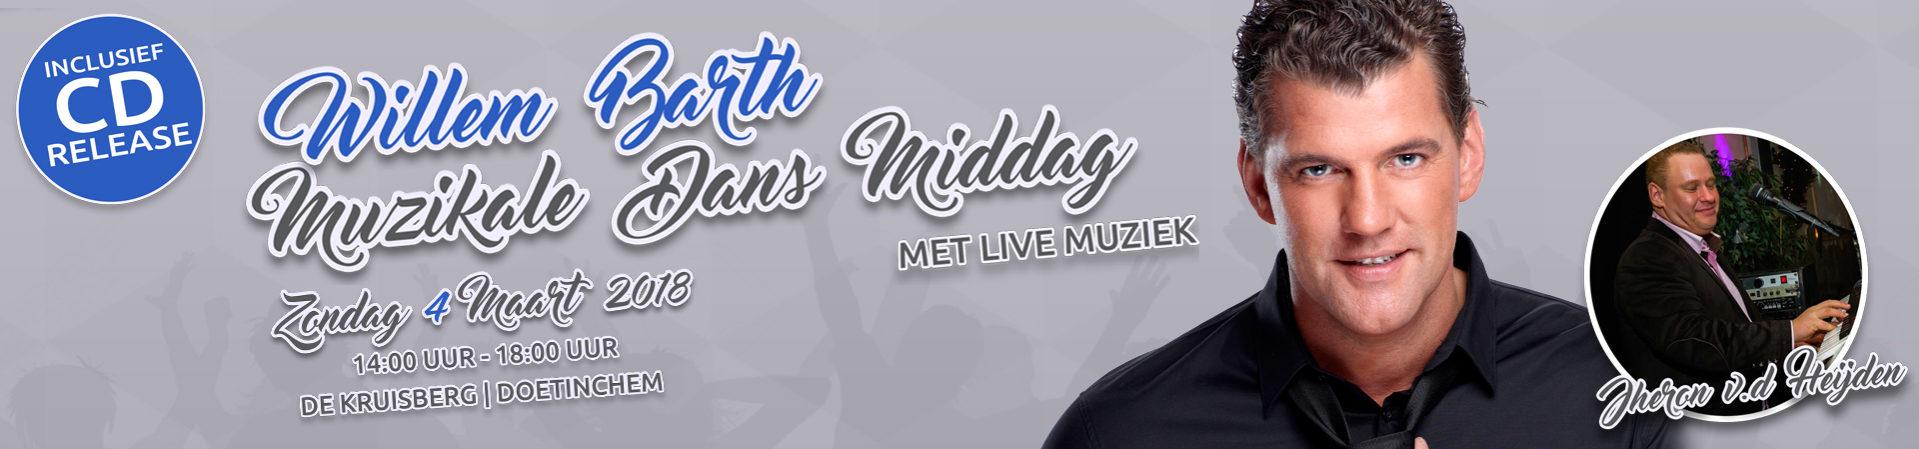 1920x450 Willem Barth Muzikale Dansmiddag